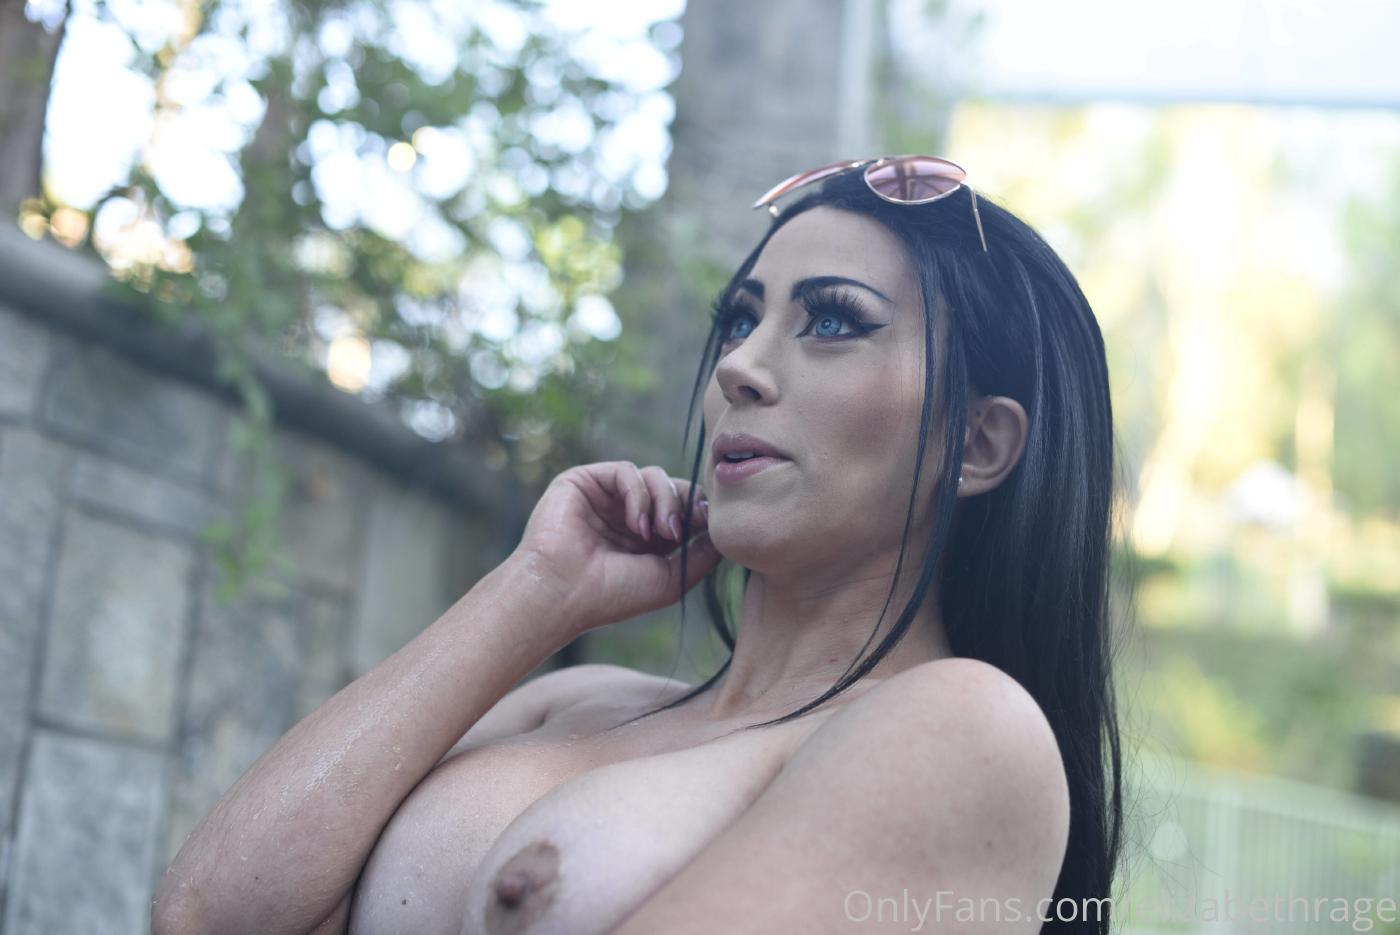 Elizabeth Rage Nude Outdoor Pool Onlyfans Set Leaked 0037